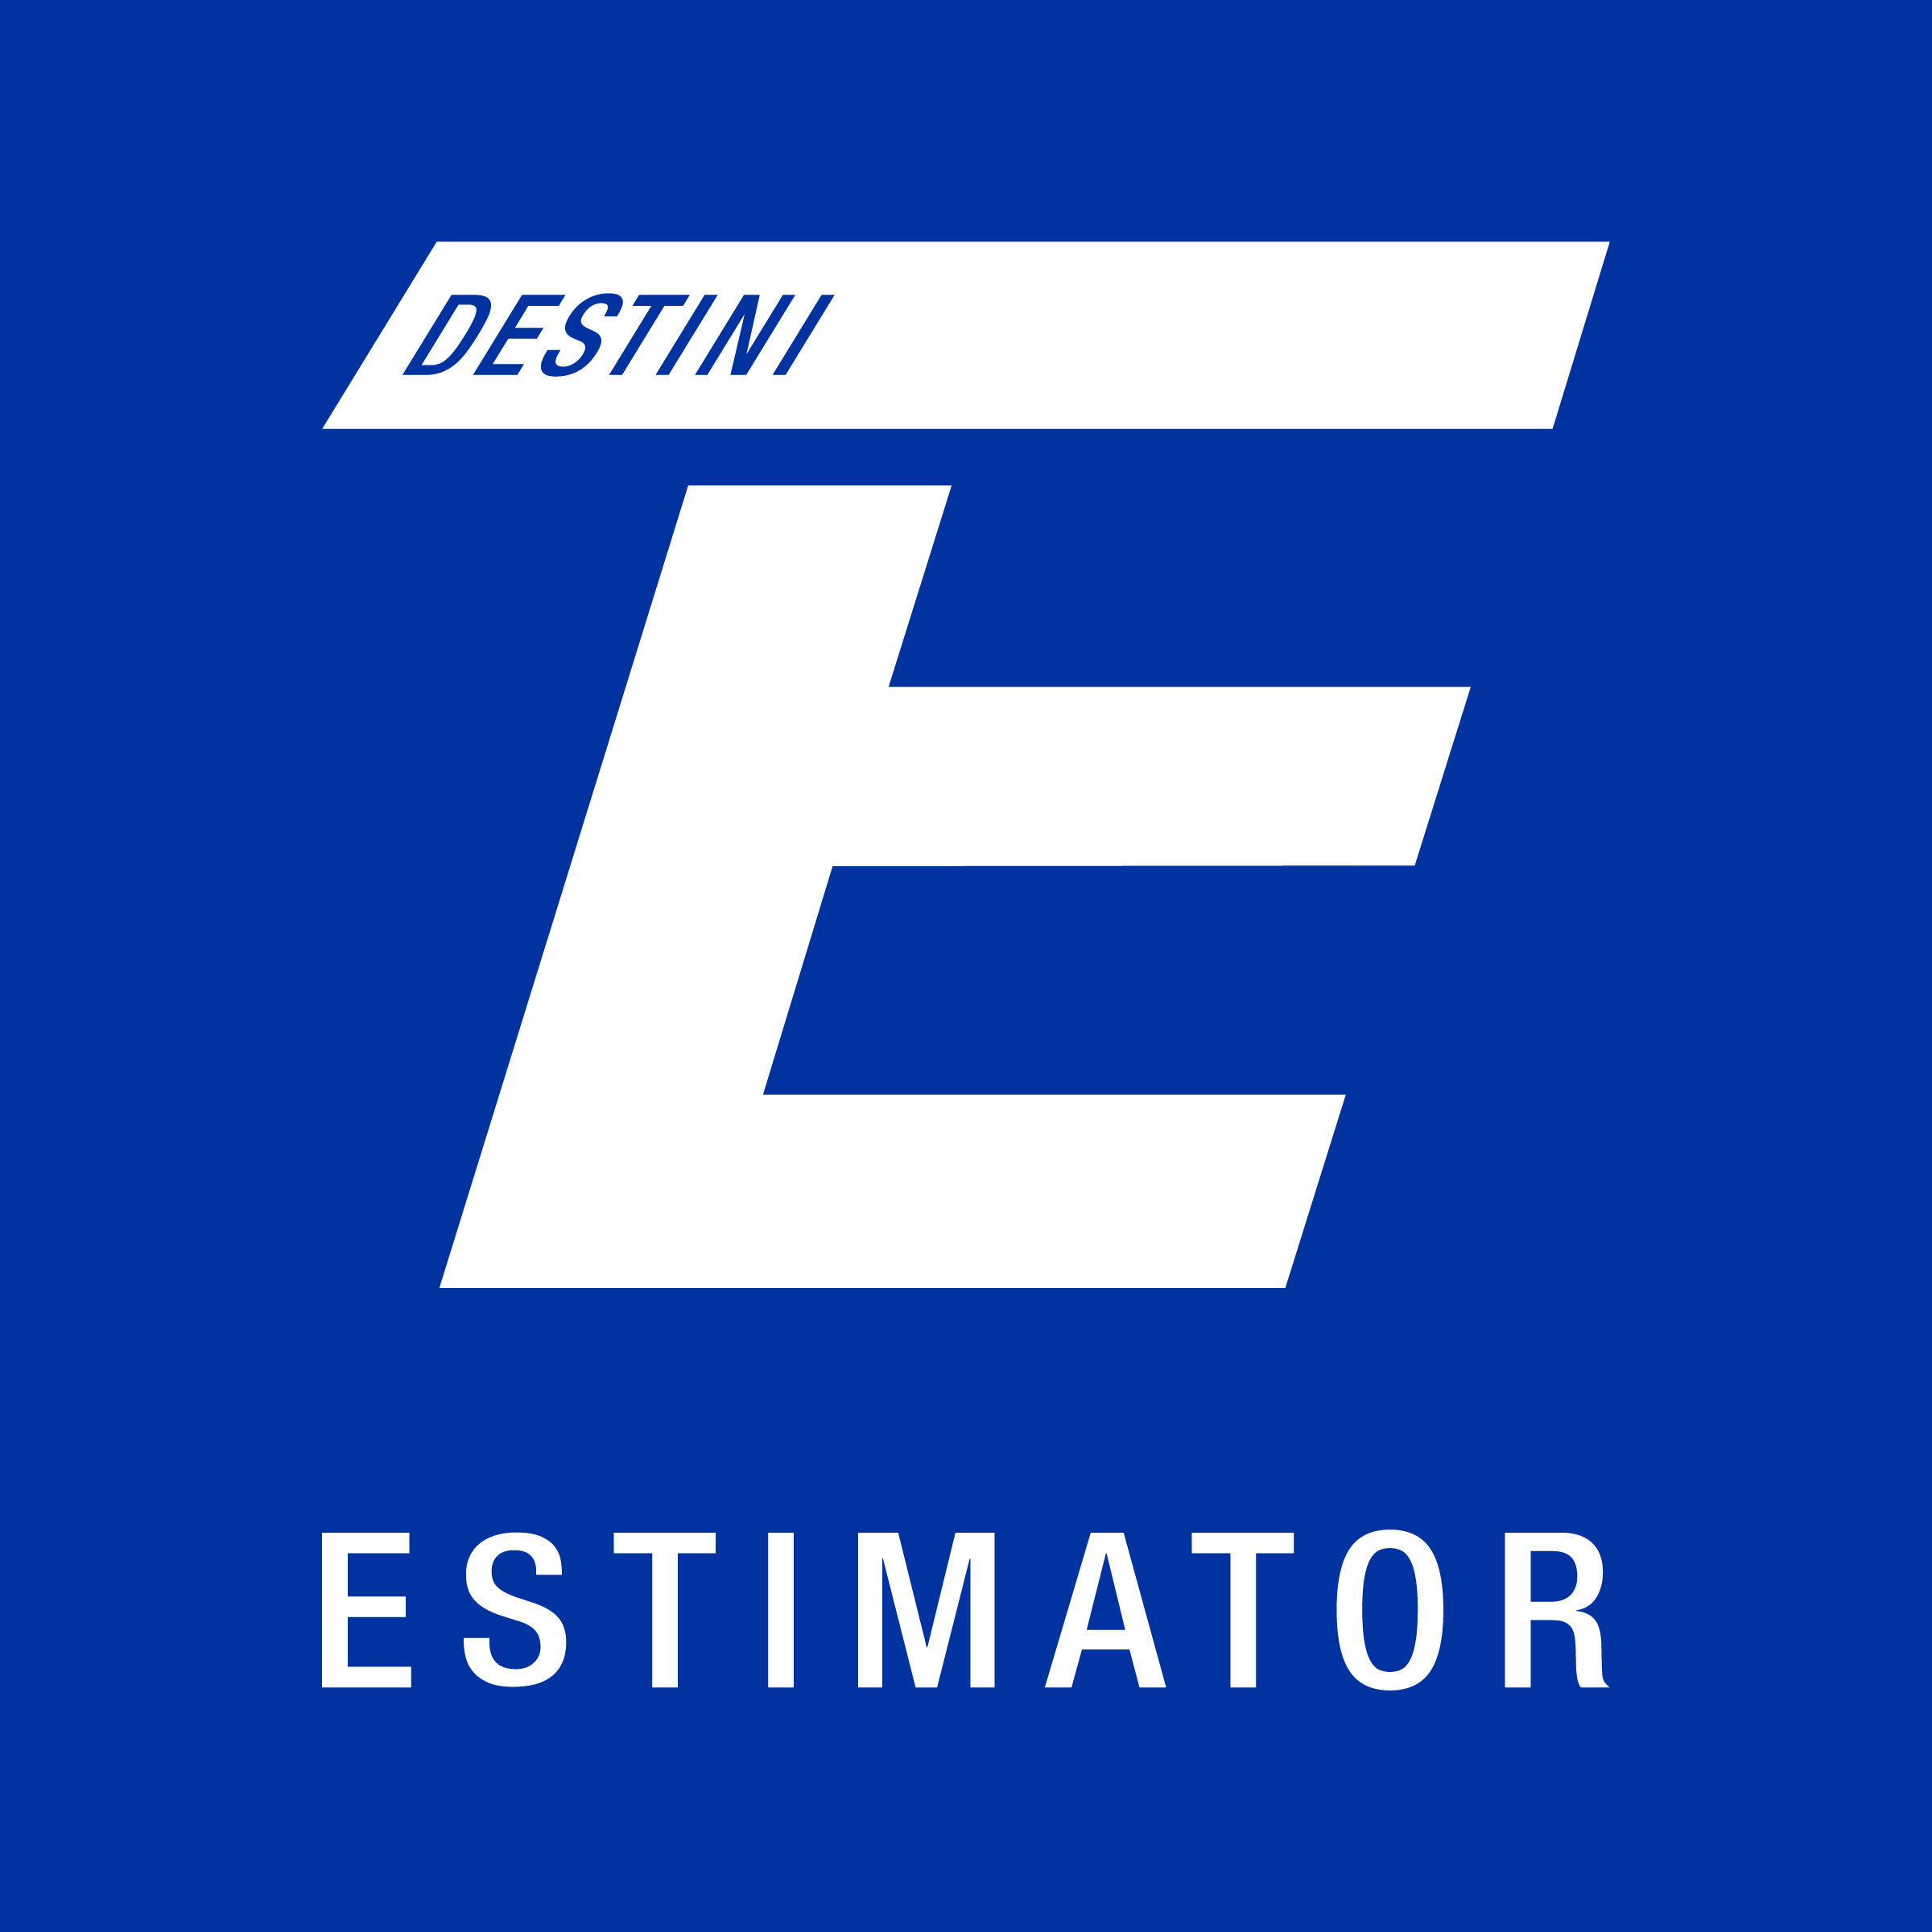 DESTINI Estimator logo